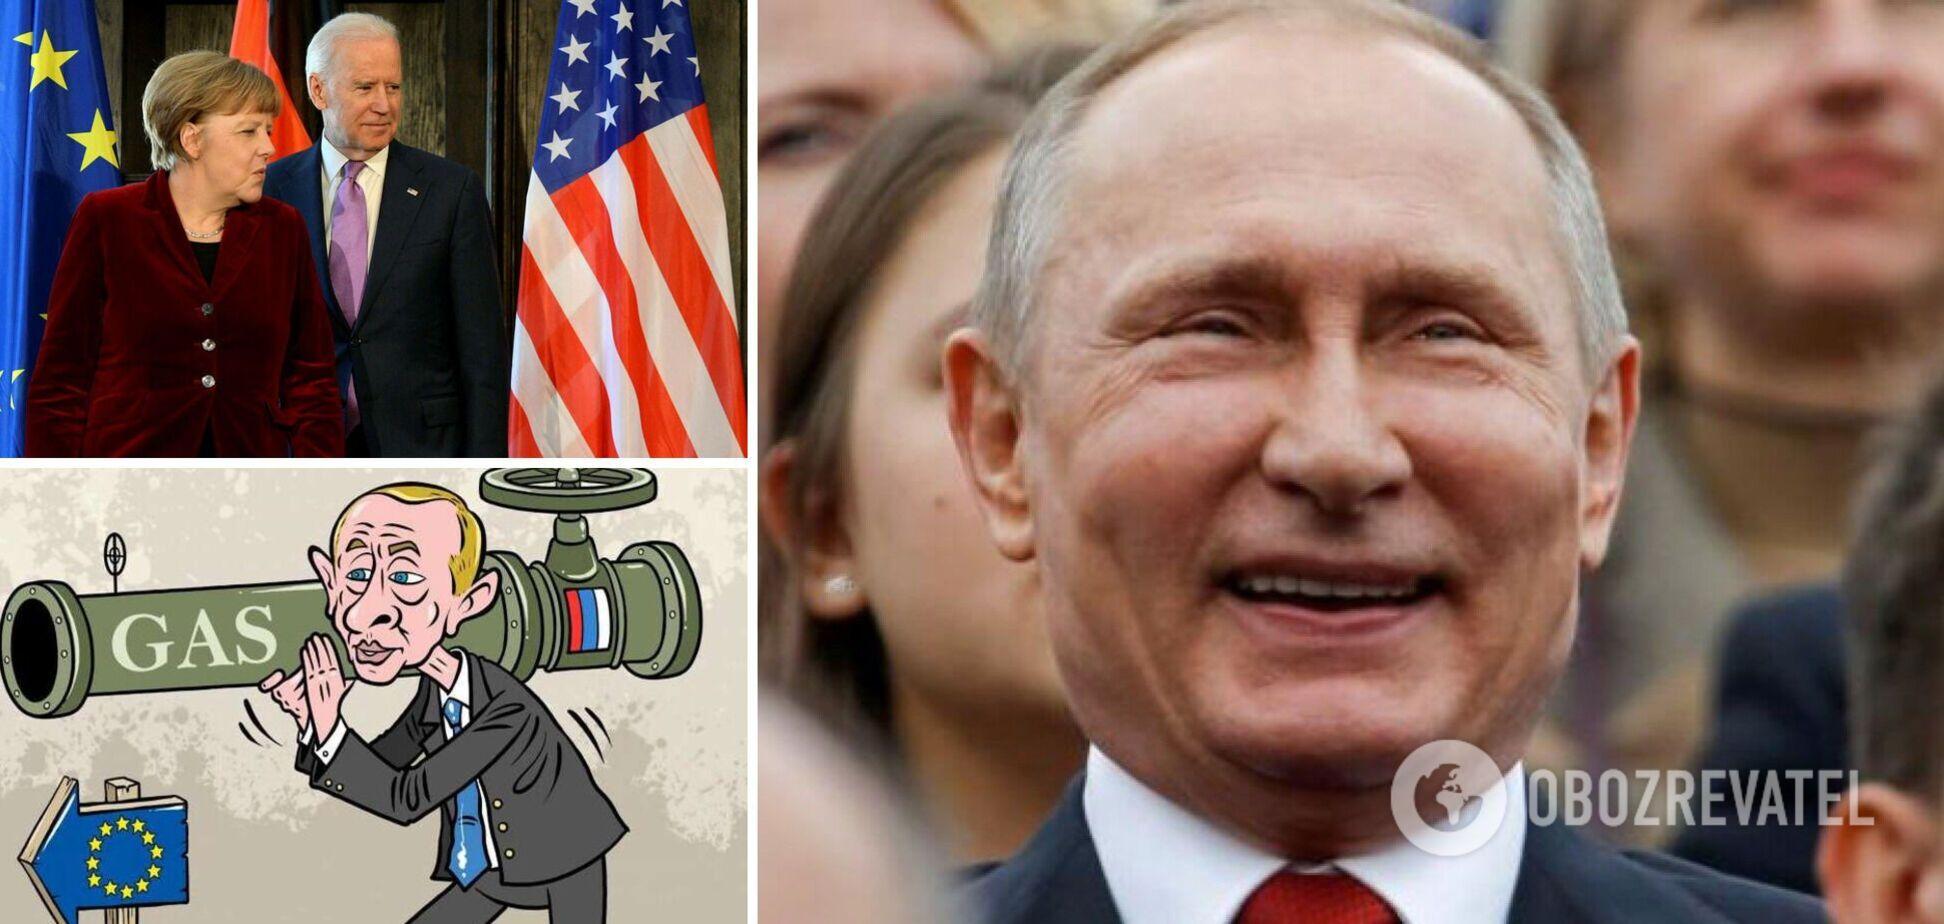 'Холодная зима' 2021-го. 'Газпром' шантажирует, Европа молчит